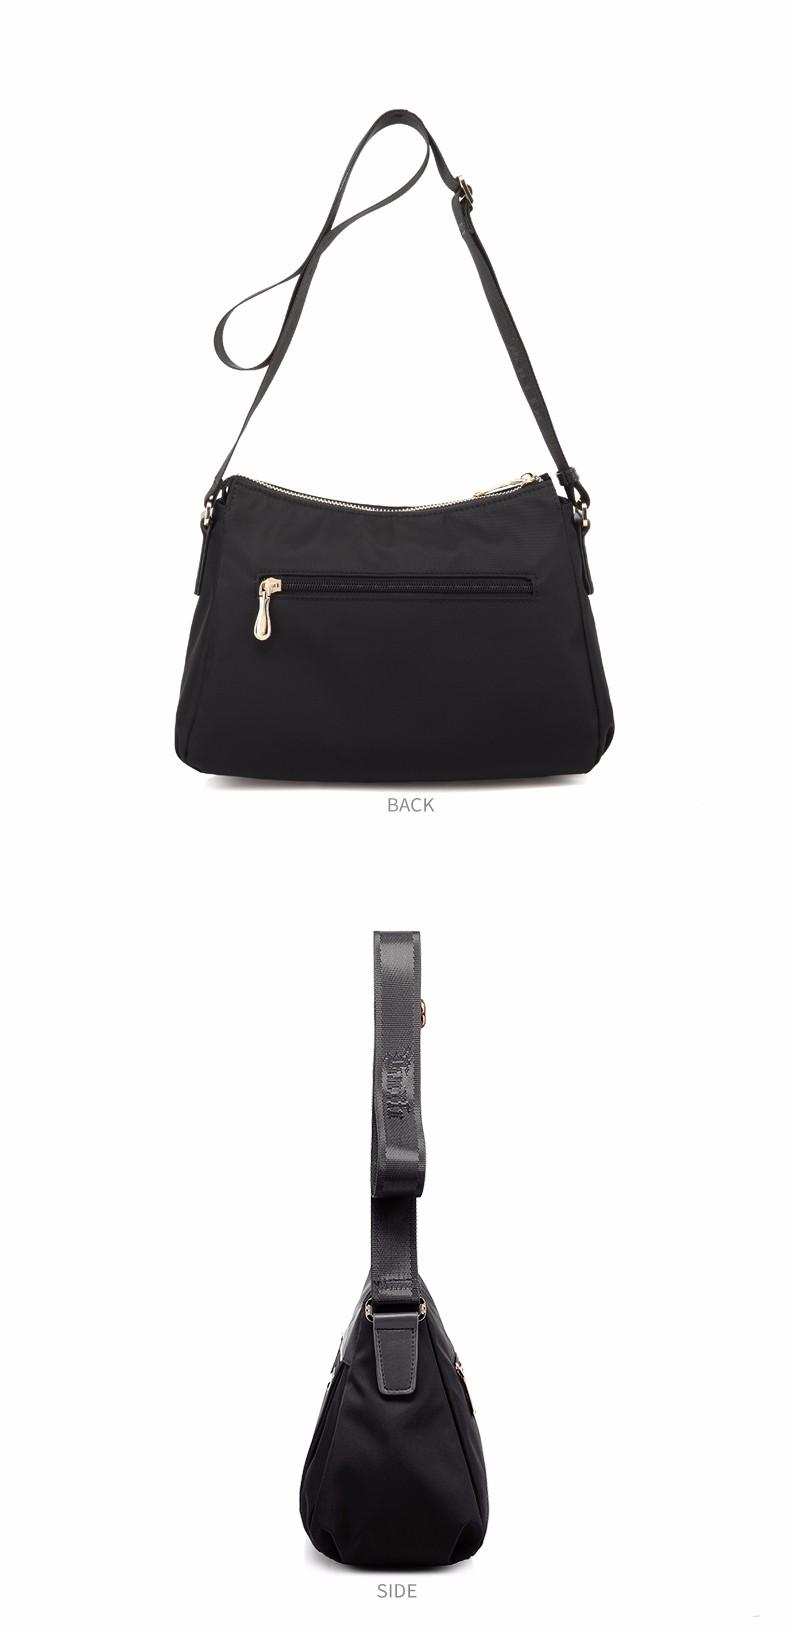 Laifu Famous Brand Women Nylon Messenger Bag Teenage Girls Luxury Handbags Canvas Satchel European and American Style